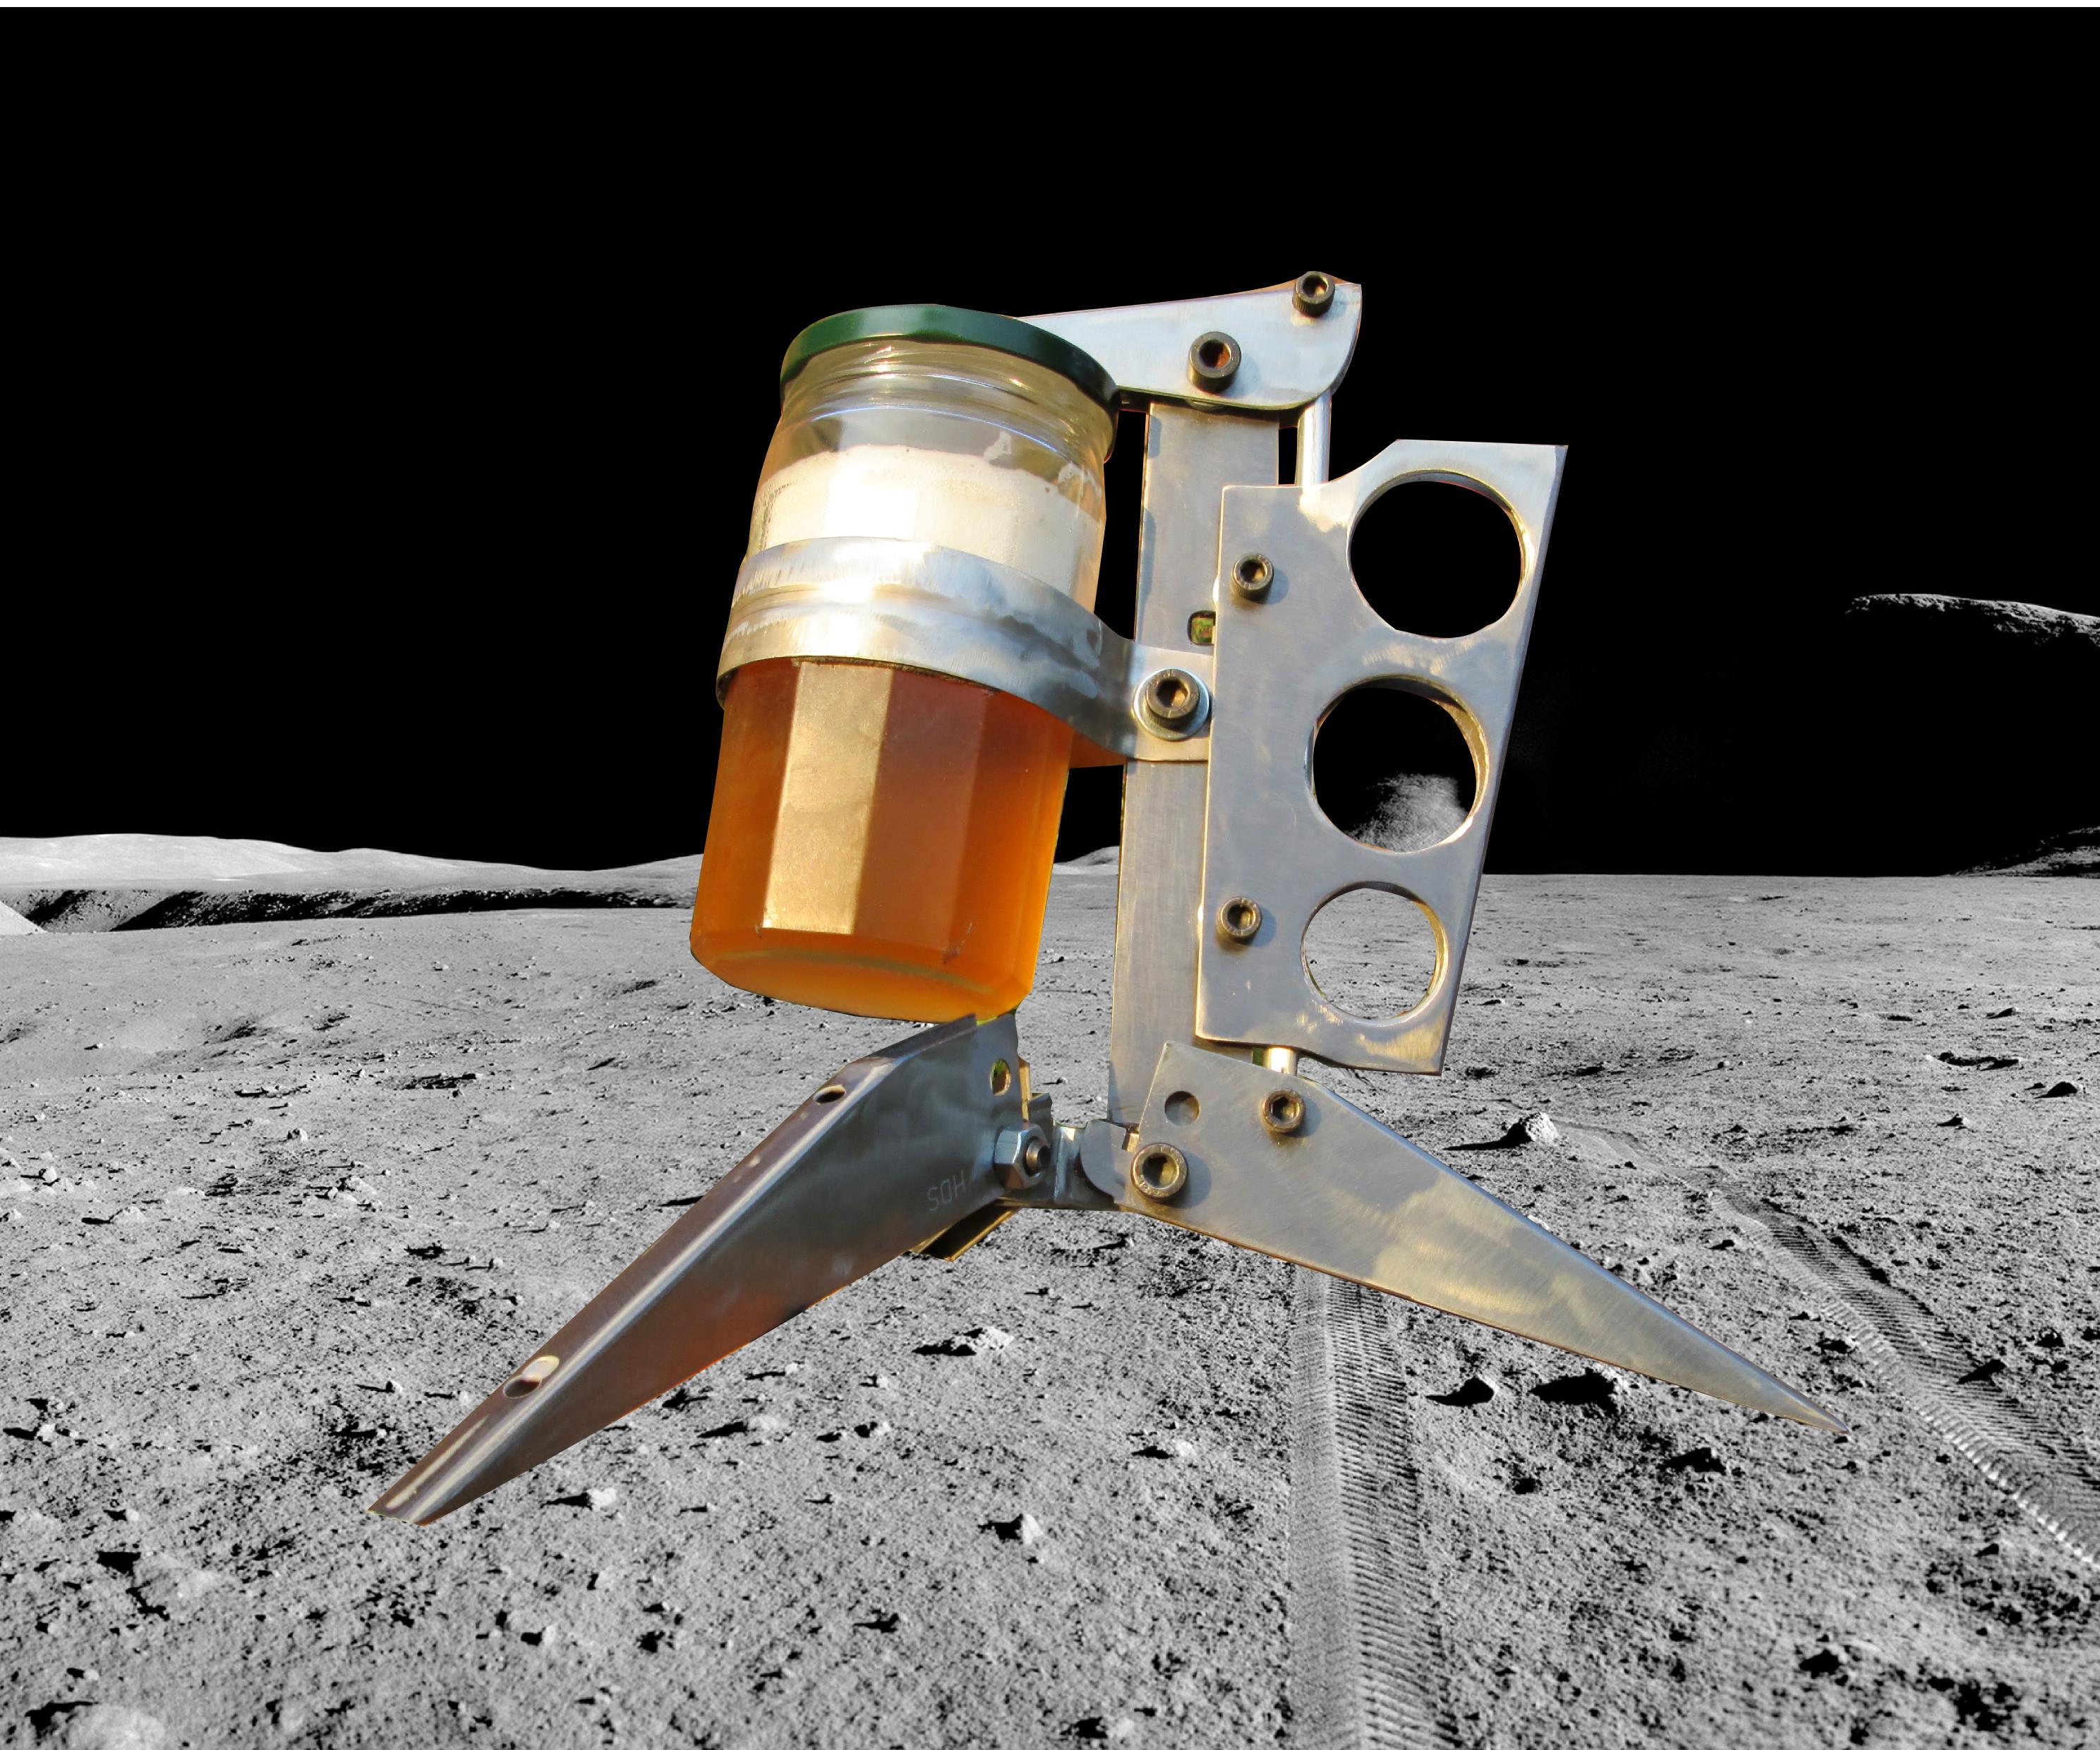 'Moon Lander' Mug (no welds, hacked hardware)